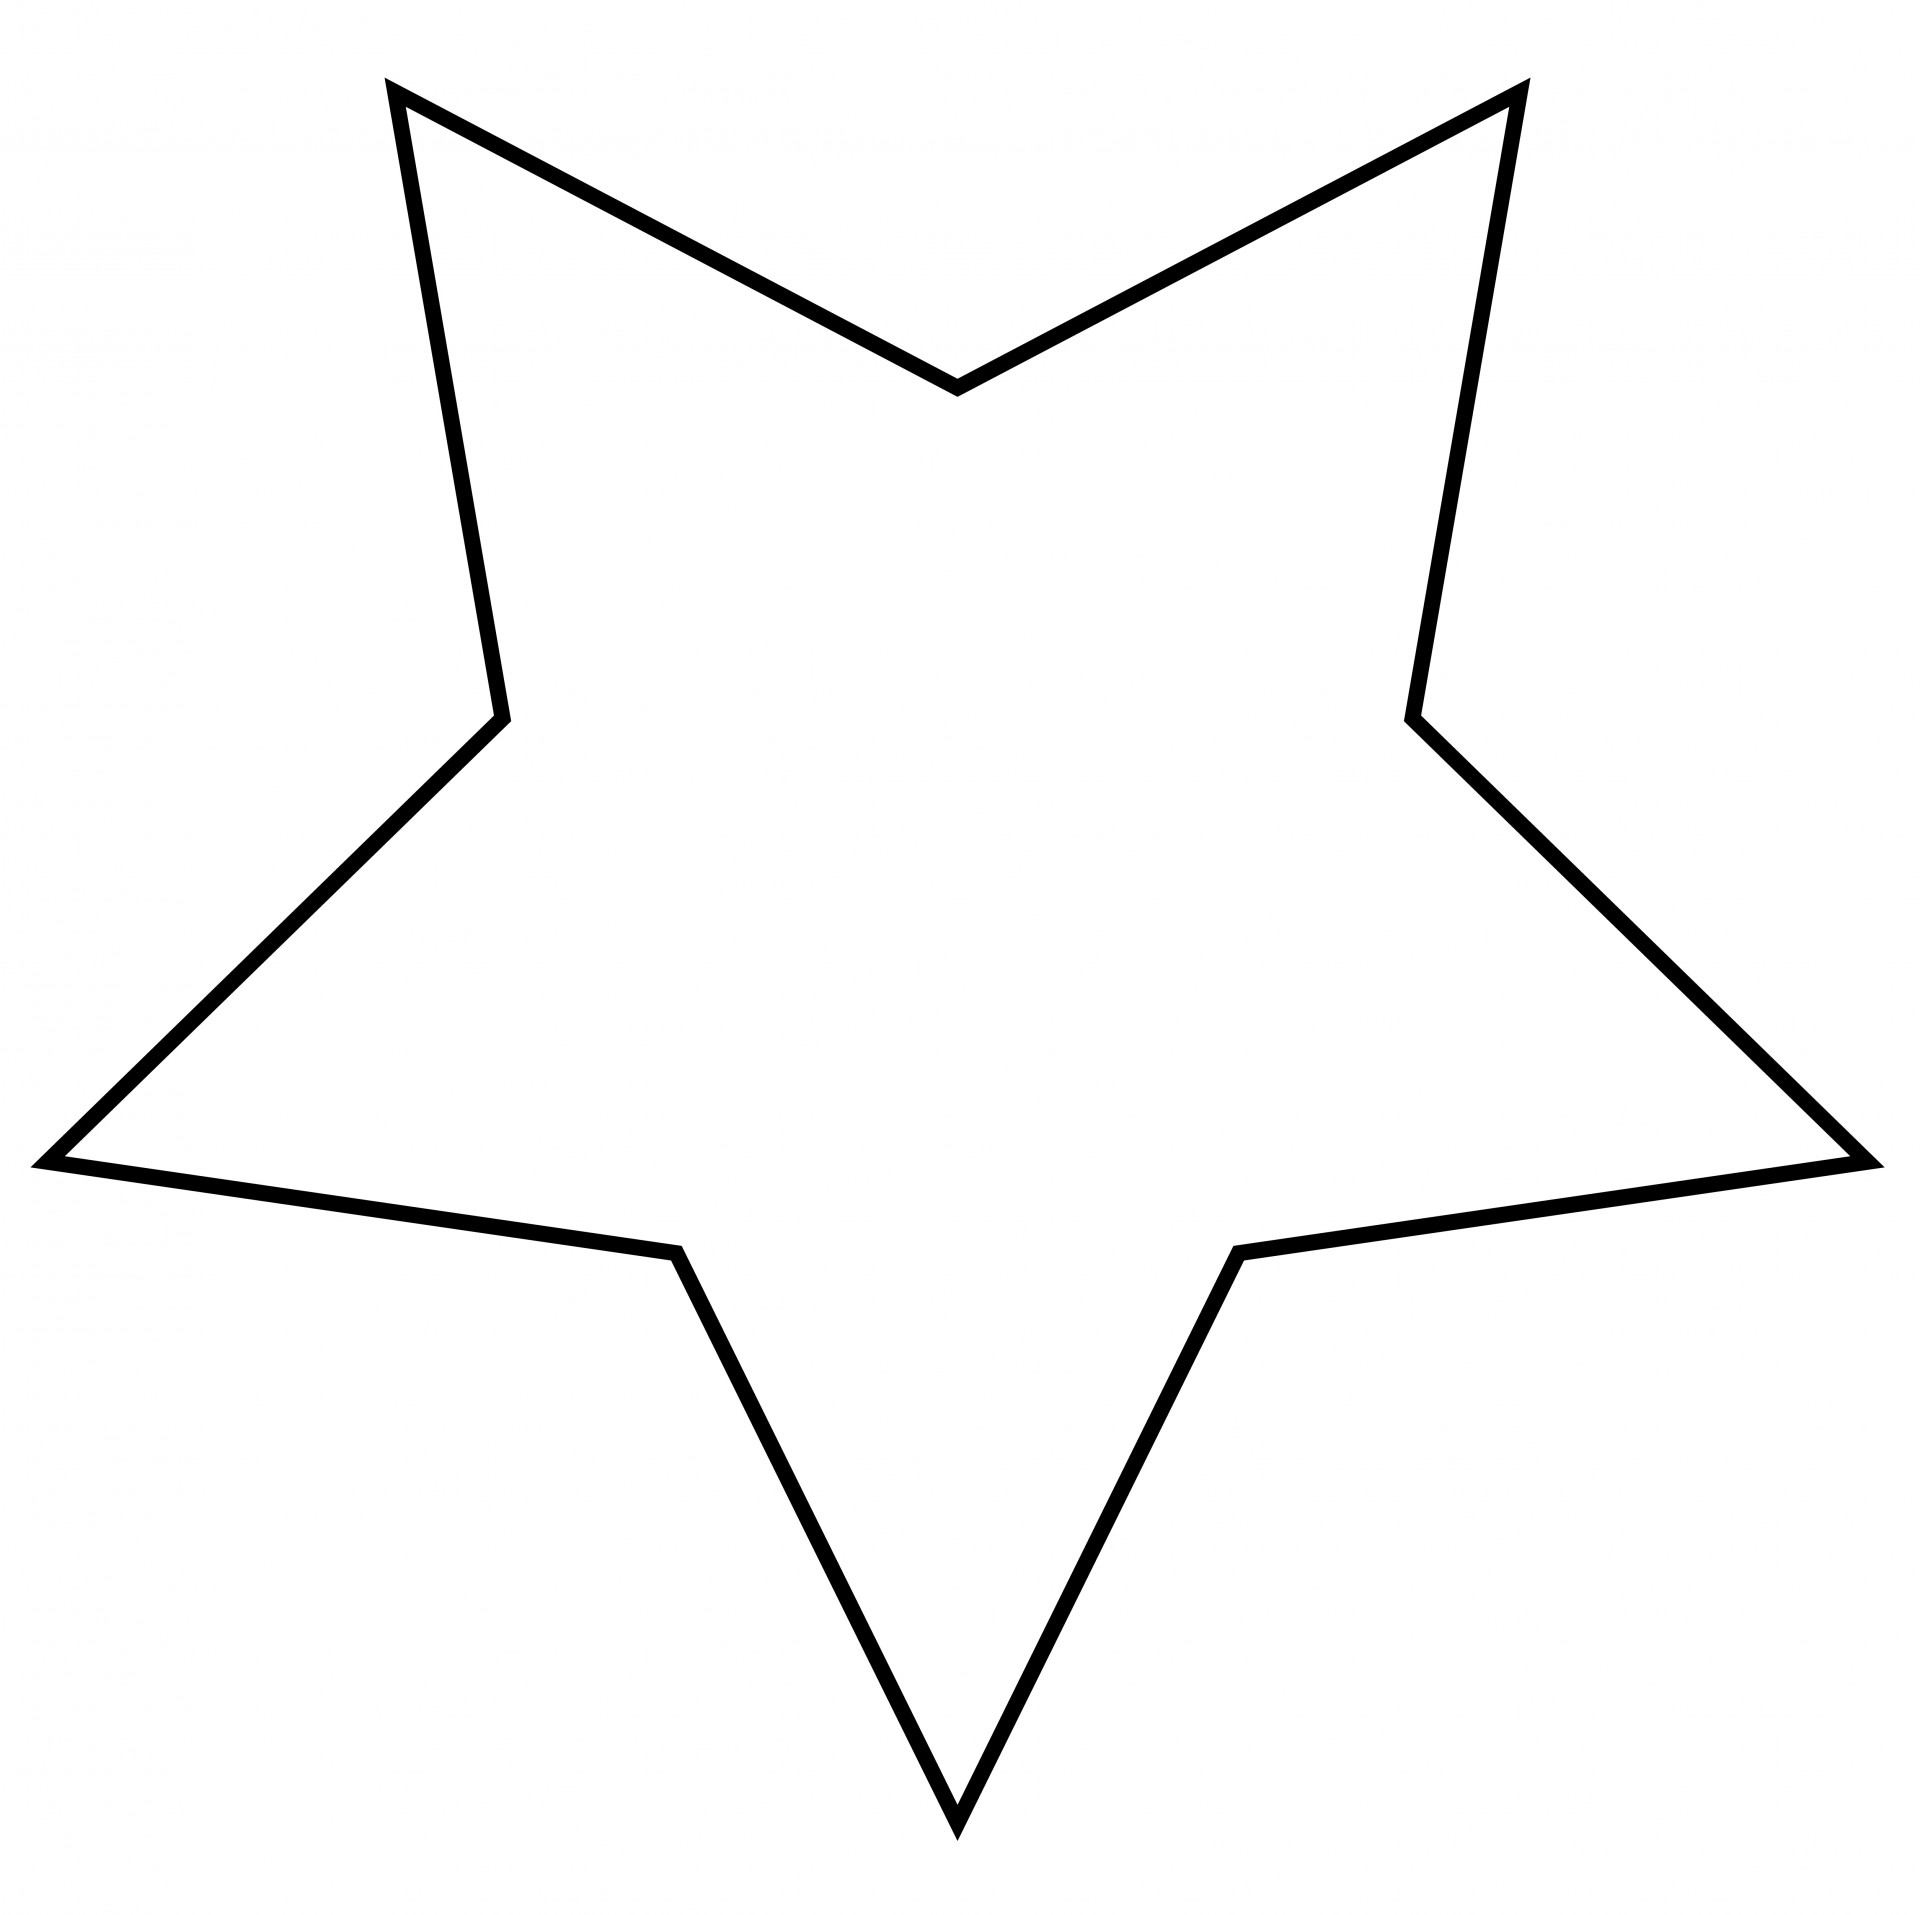 Star outline images.